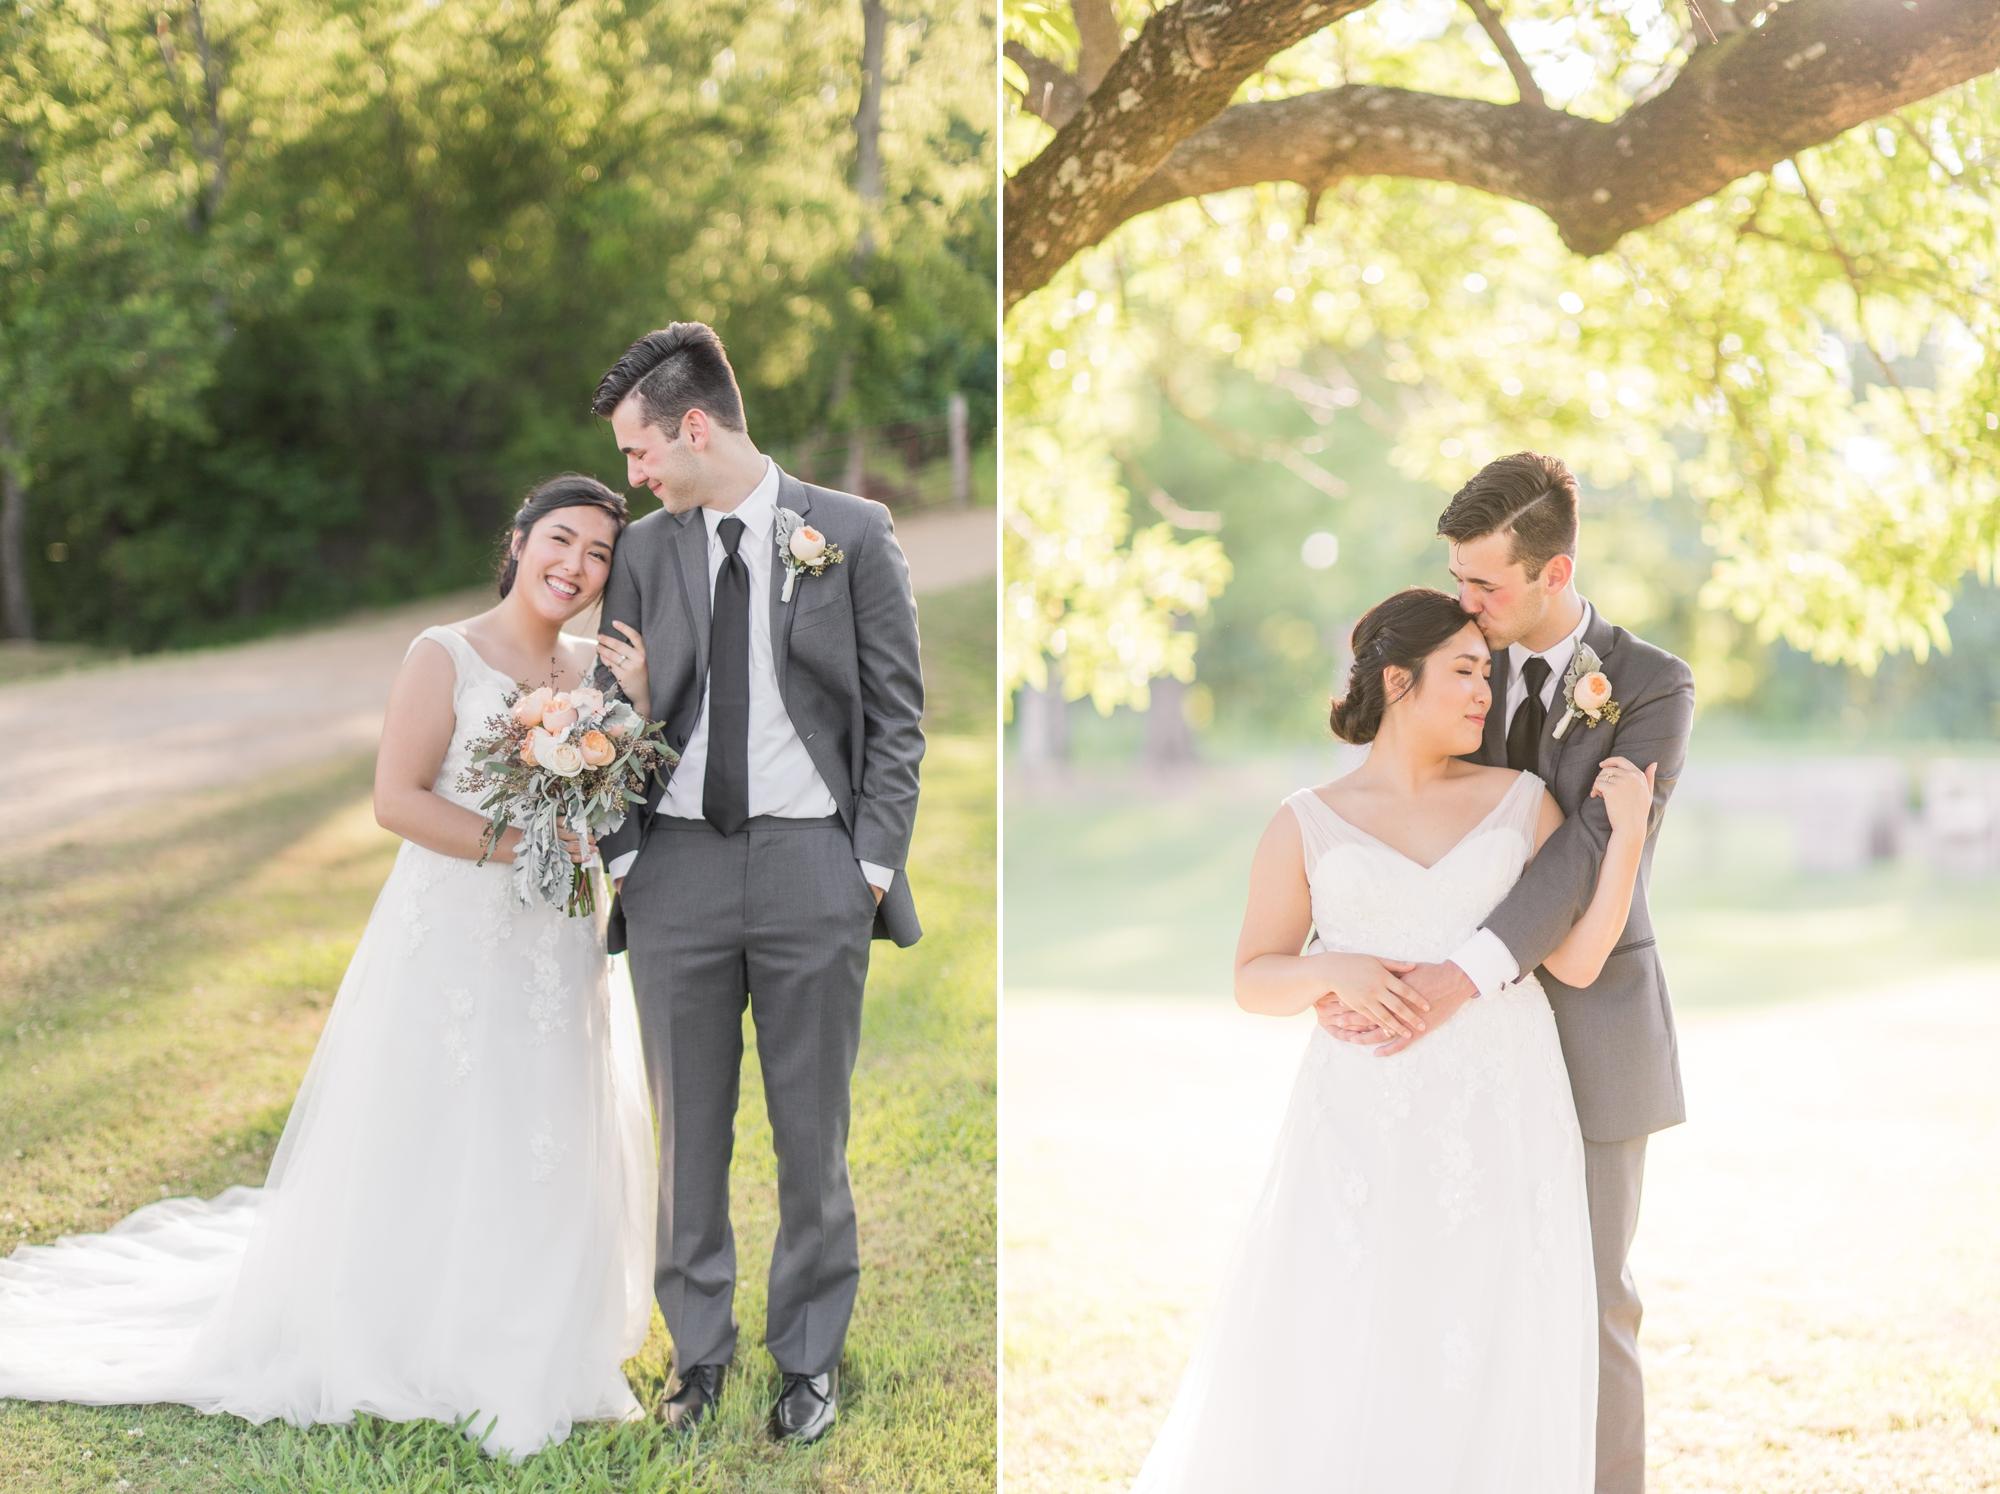 giles wedding blog 34.jpg